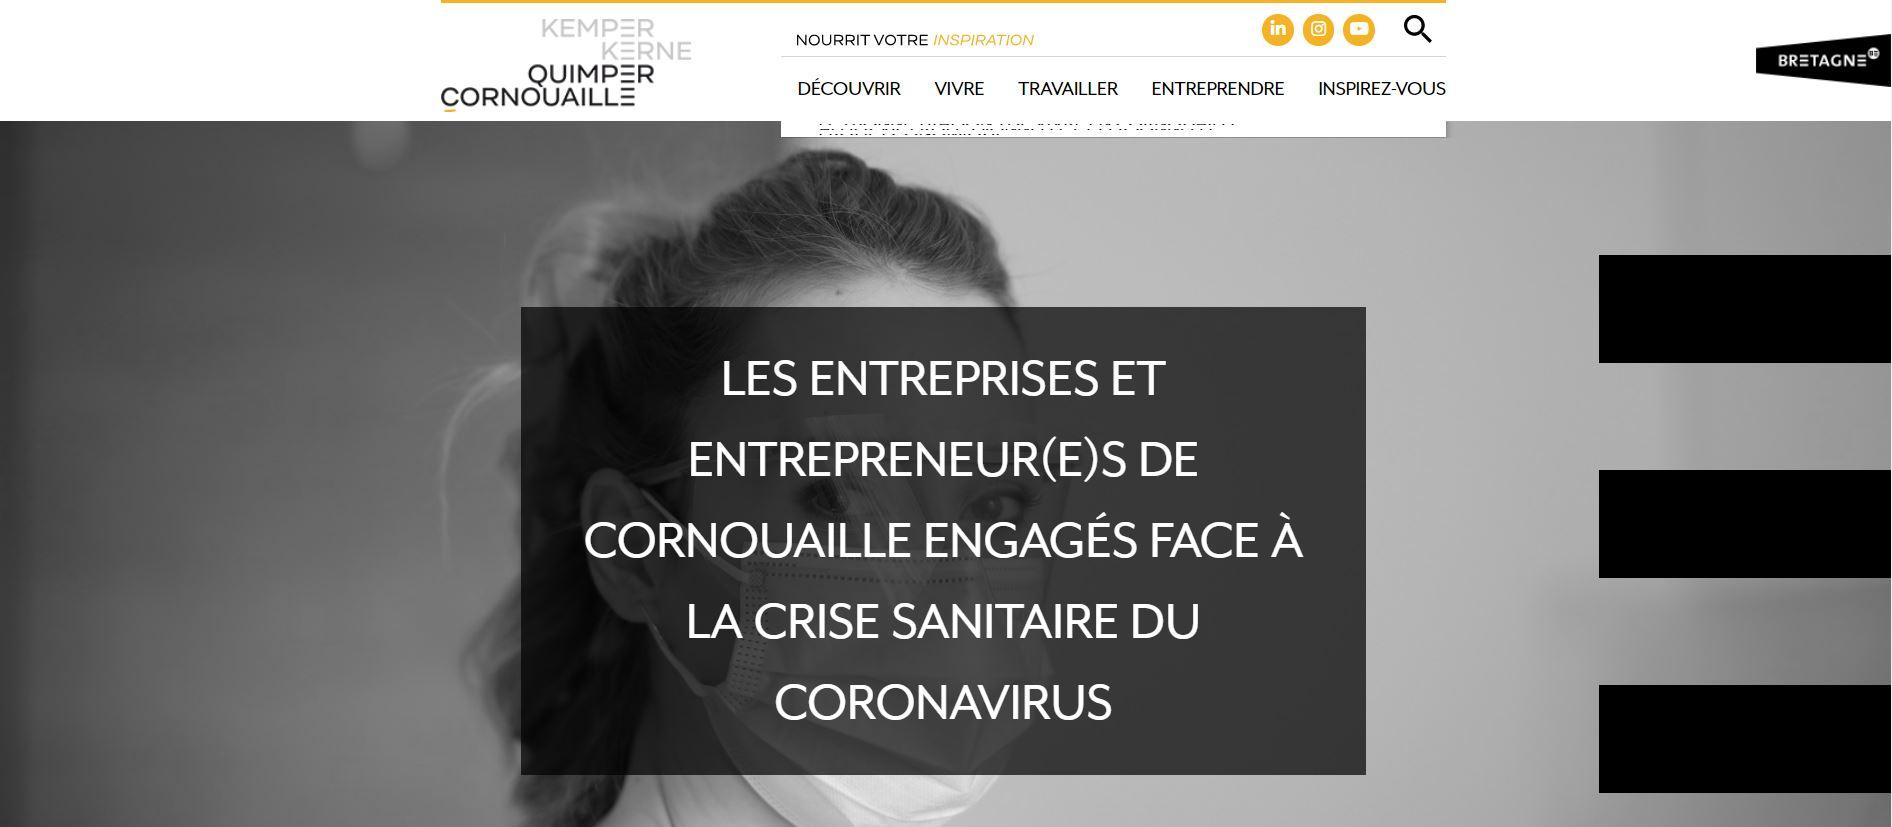 Page covid-19 de la plateforme attractivité www.quimpercornouaille.bzh